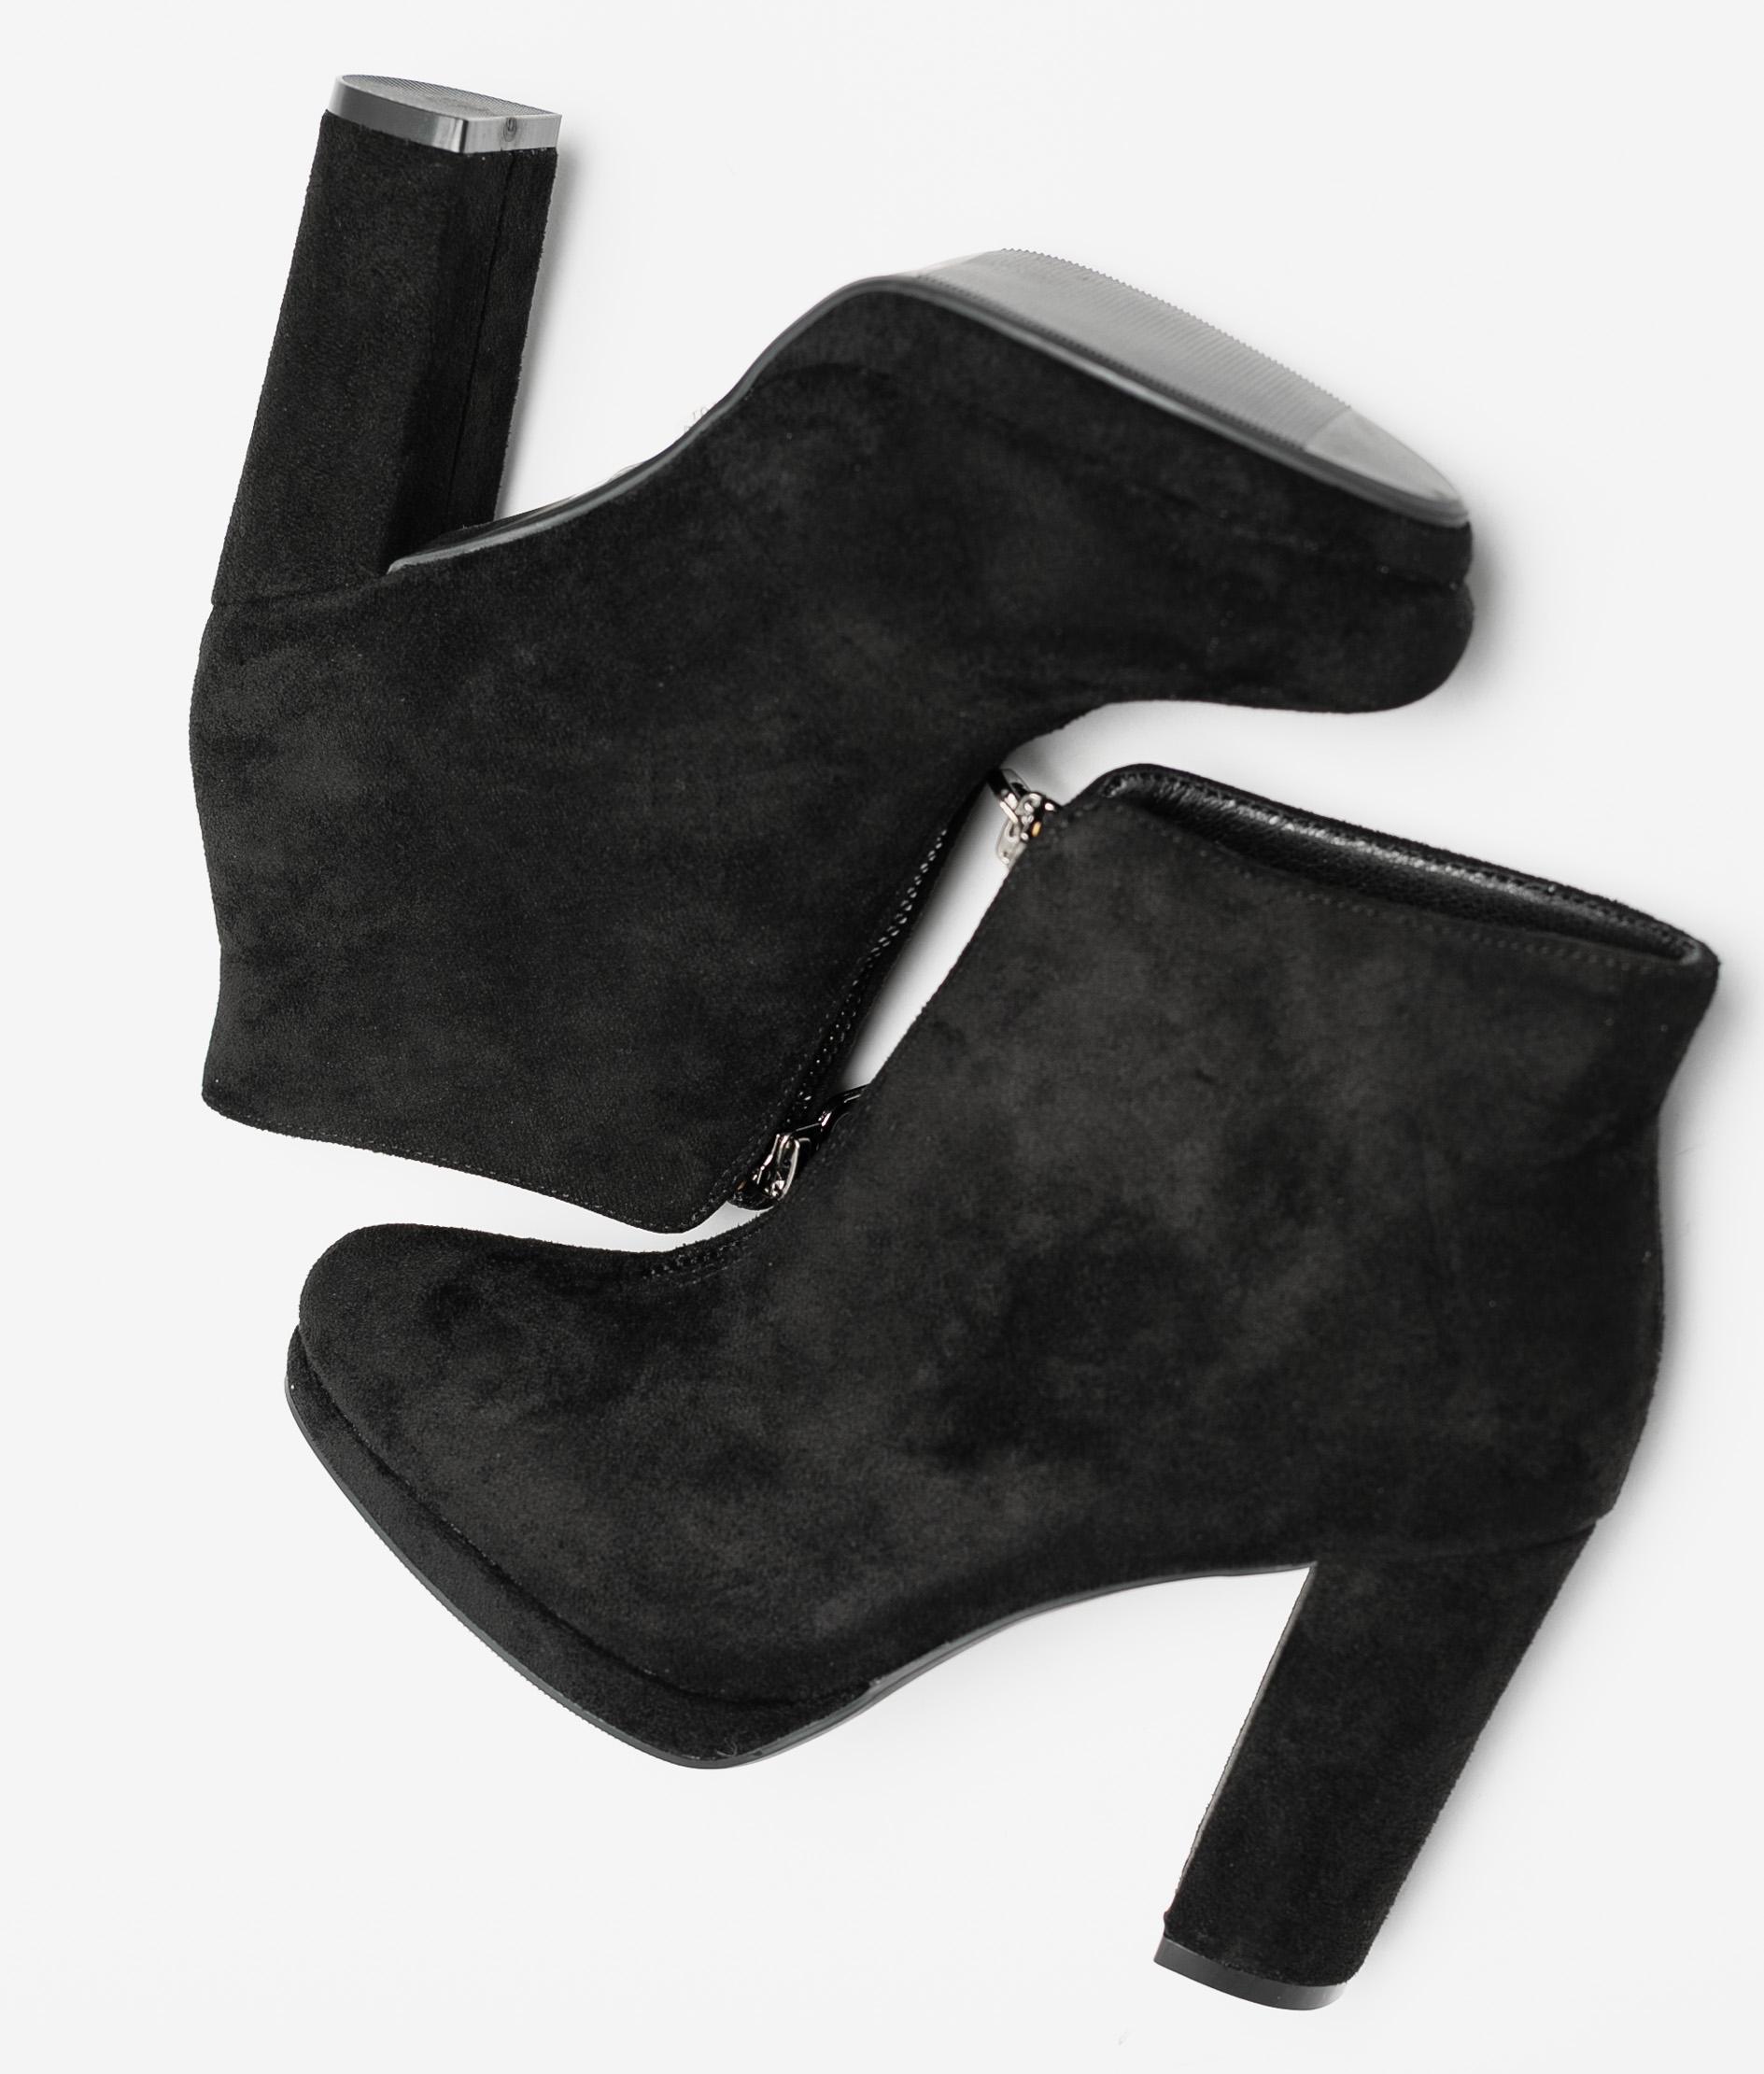 Boot Petite Kala - Noir